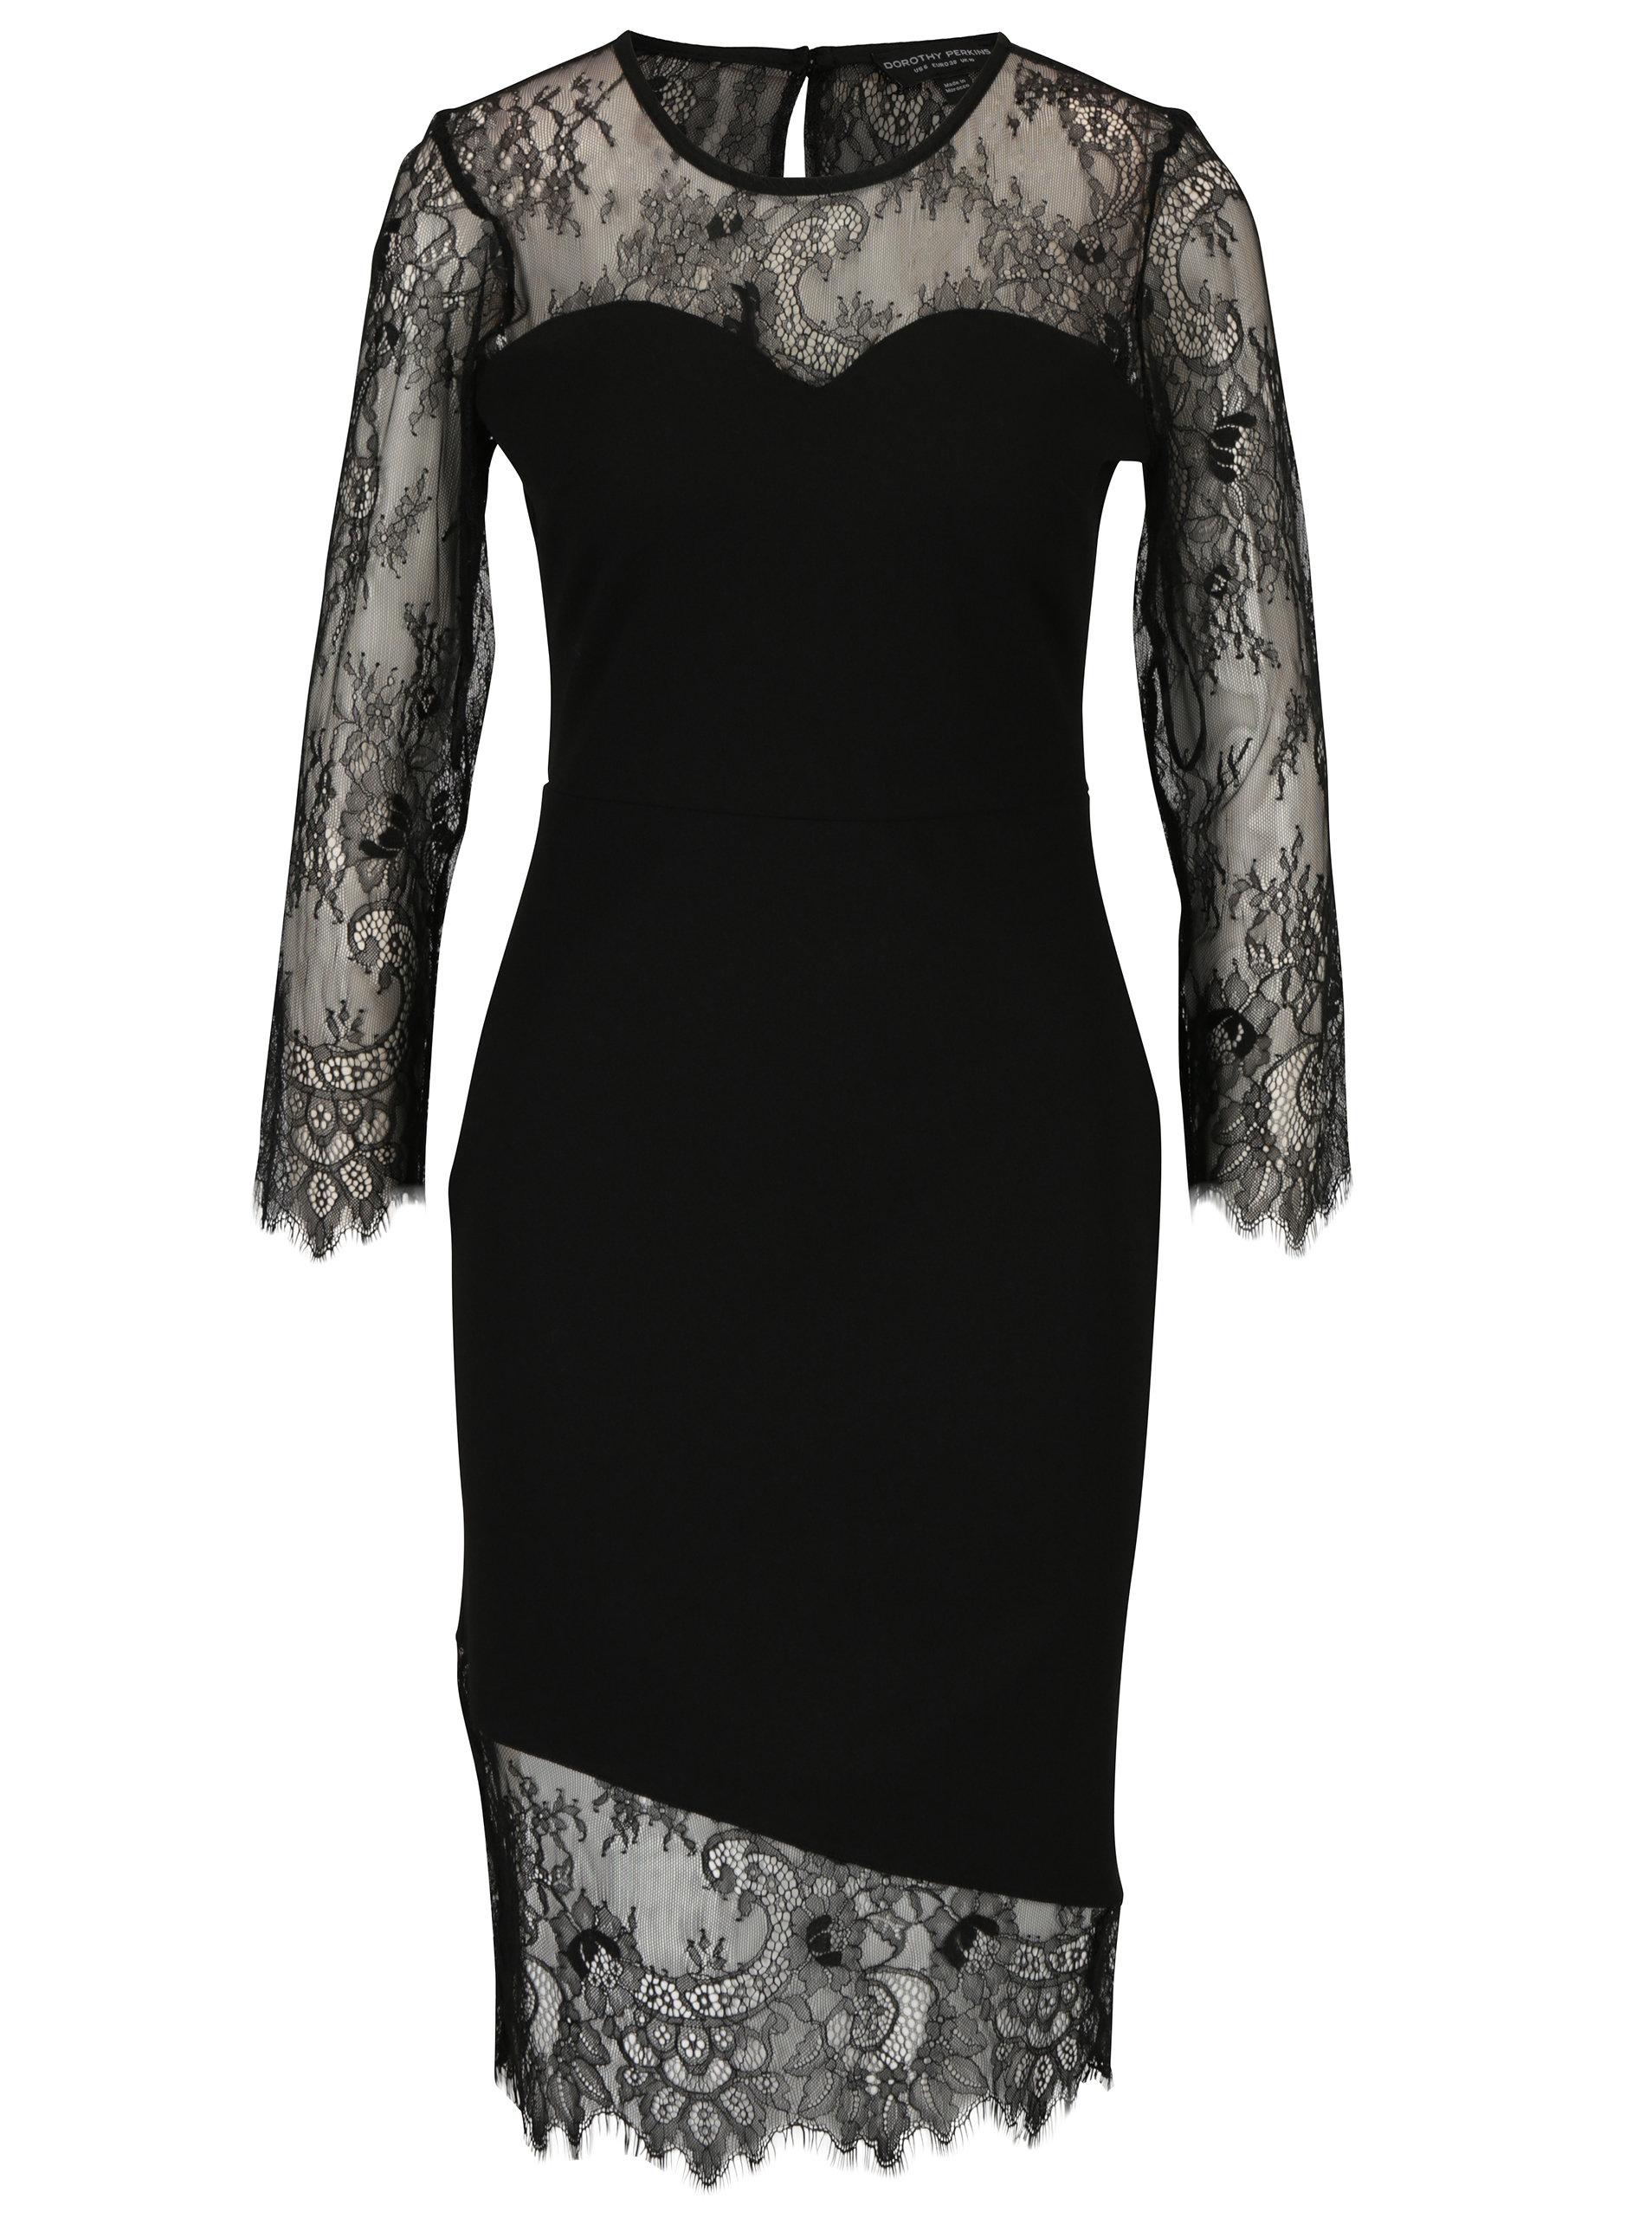 8b407bf0dce4 Černé pouzdrové šaty s krajkou Dorothy Perkins ...